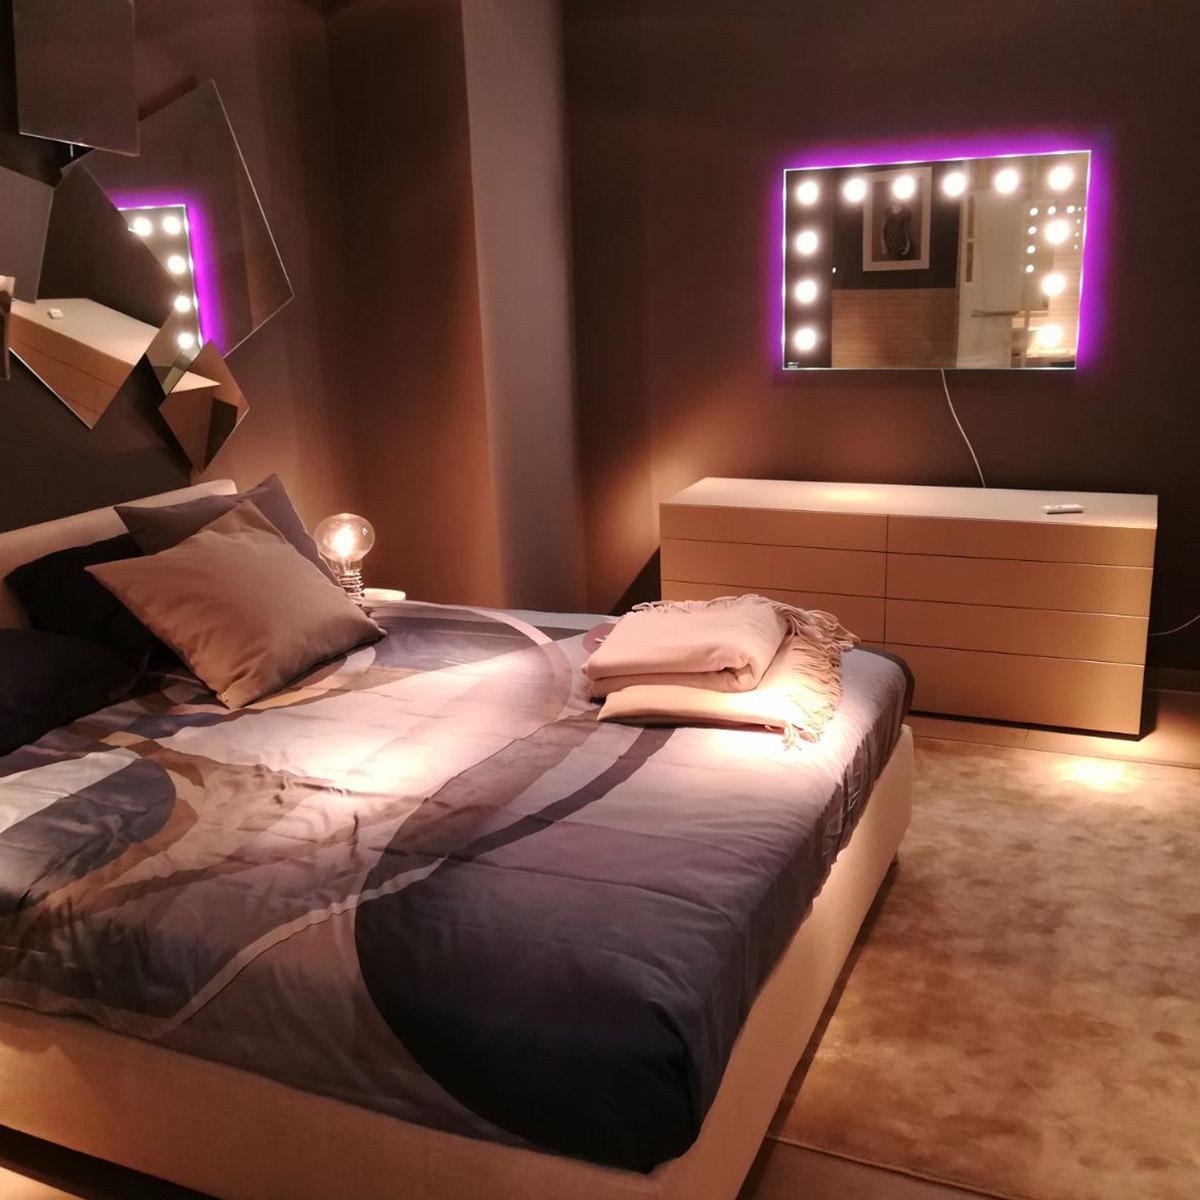 Divino Mirror light up the bedroom